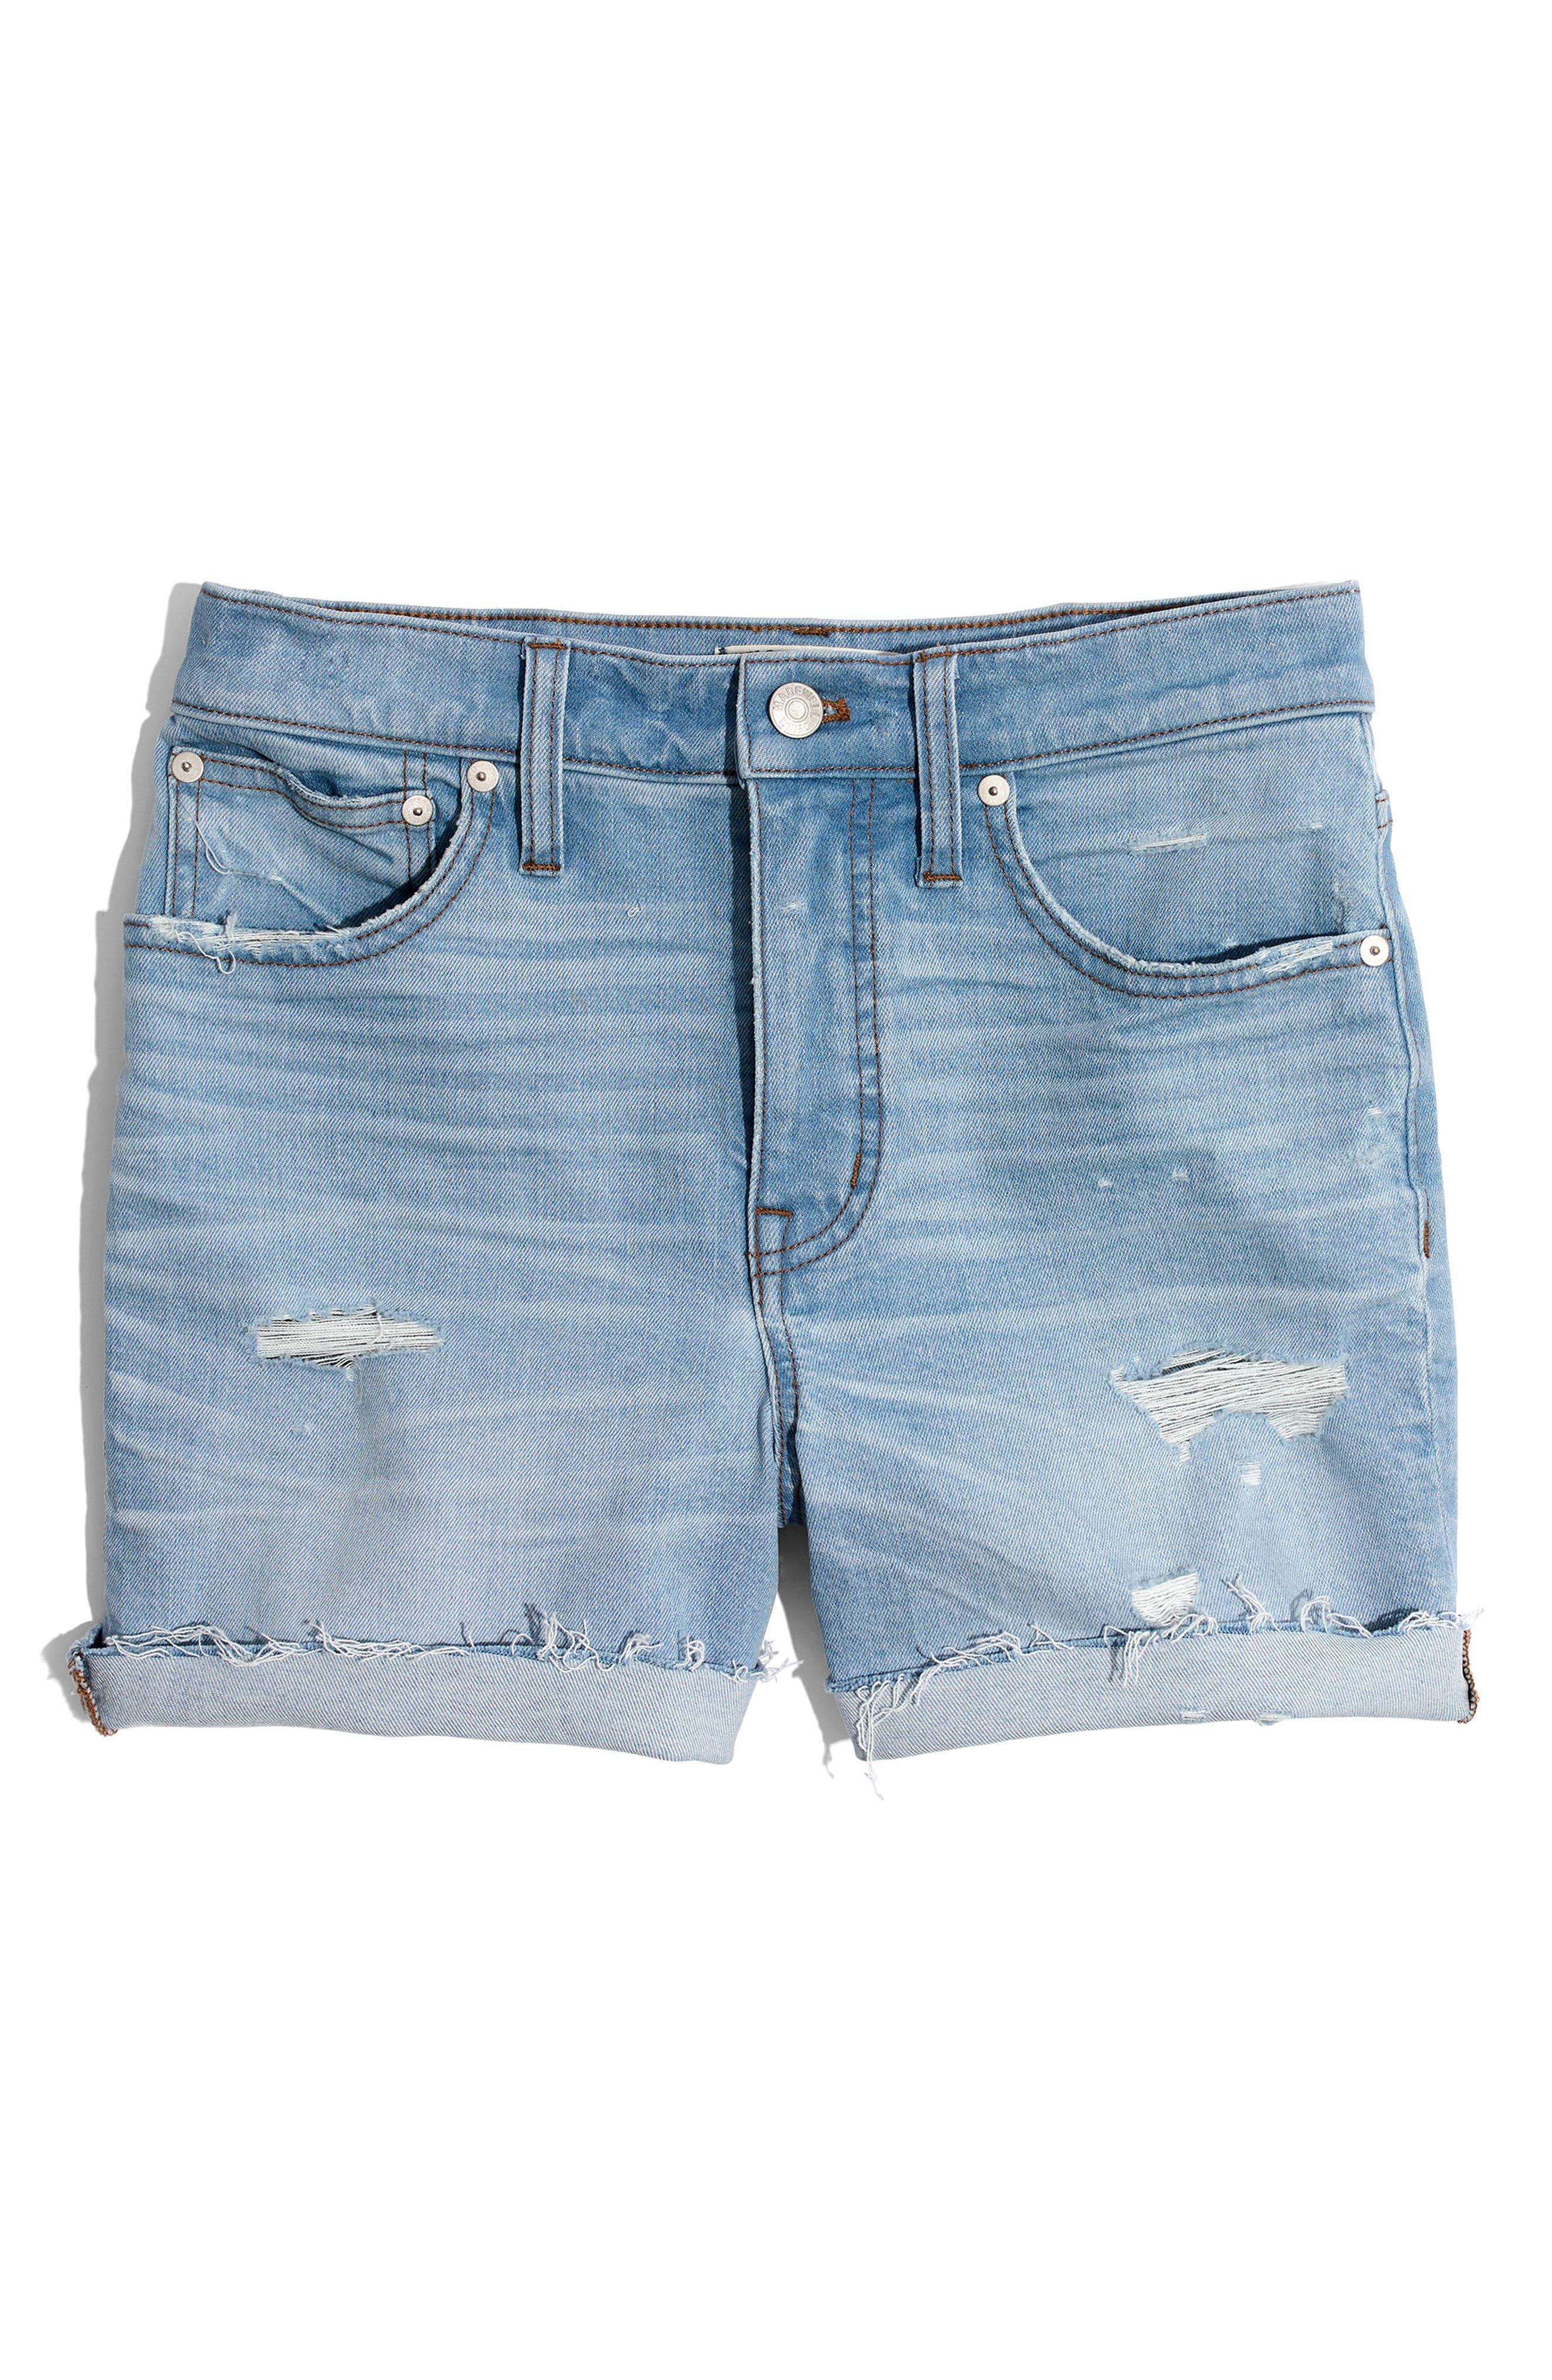 High Waist Denim Cutoff Shorts,                             Alternate thumbnail 4, color,                             Posey